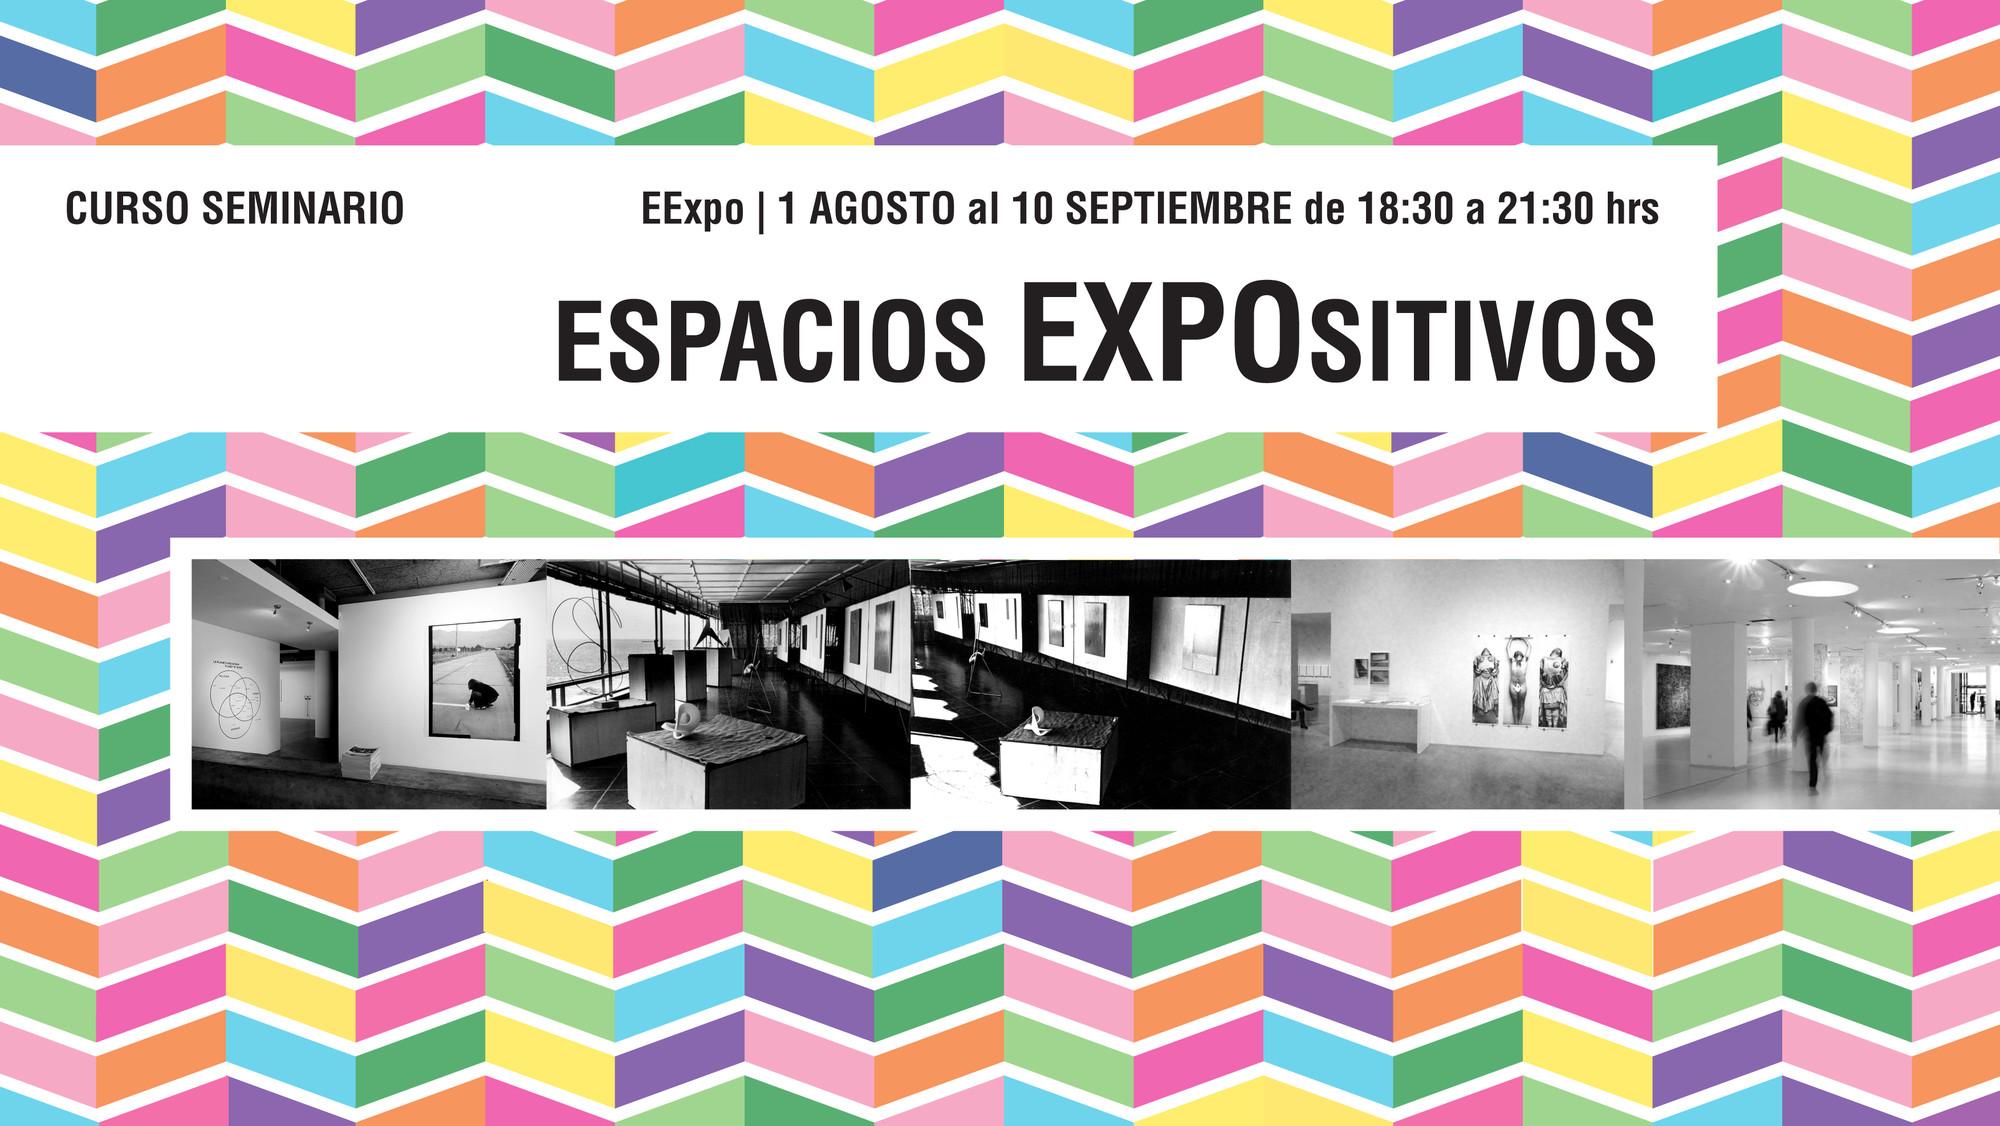 Curso Seminario Espacios EXPOsitivos, Escuela de Arquitectura UC